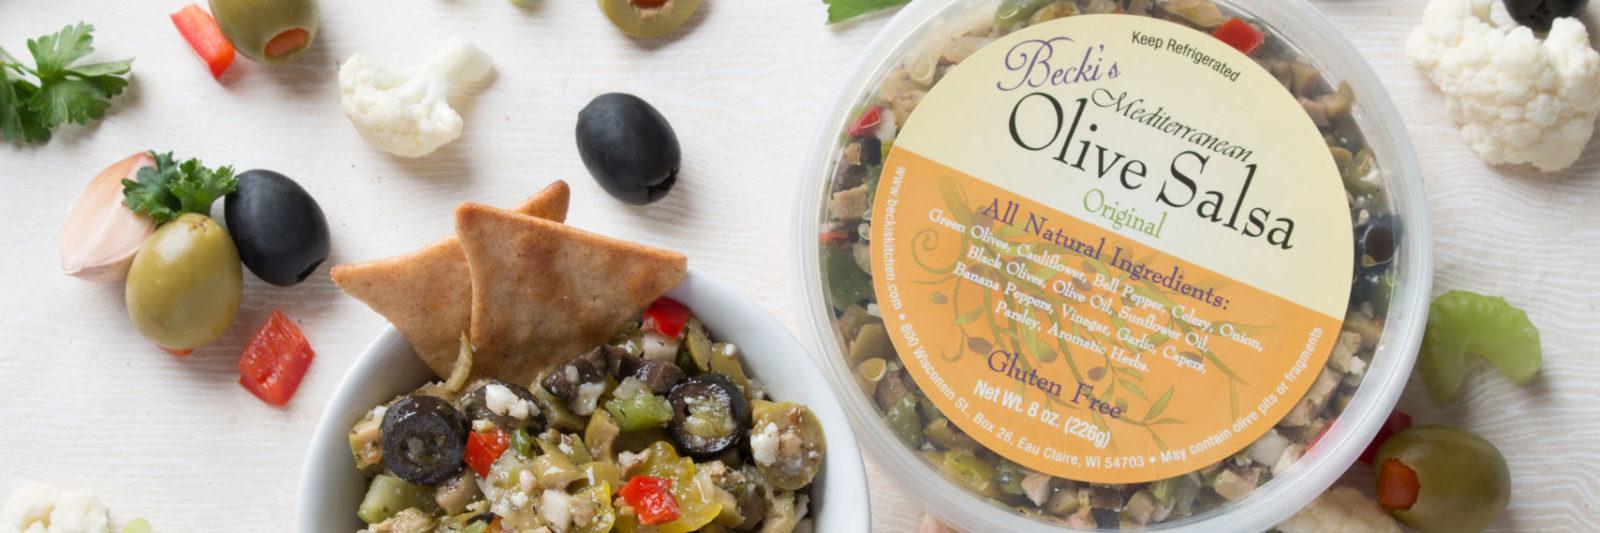 Becki's Olive Salsa Original